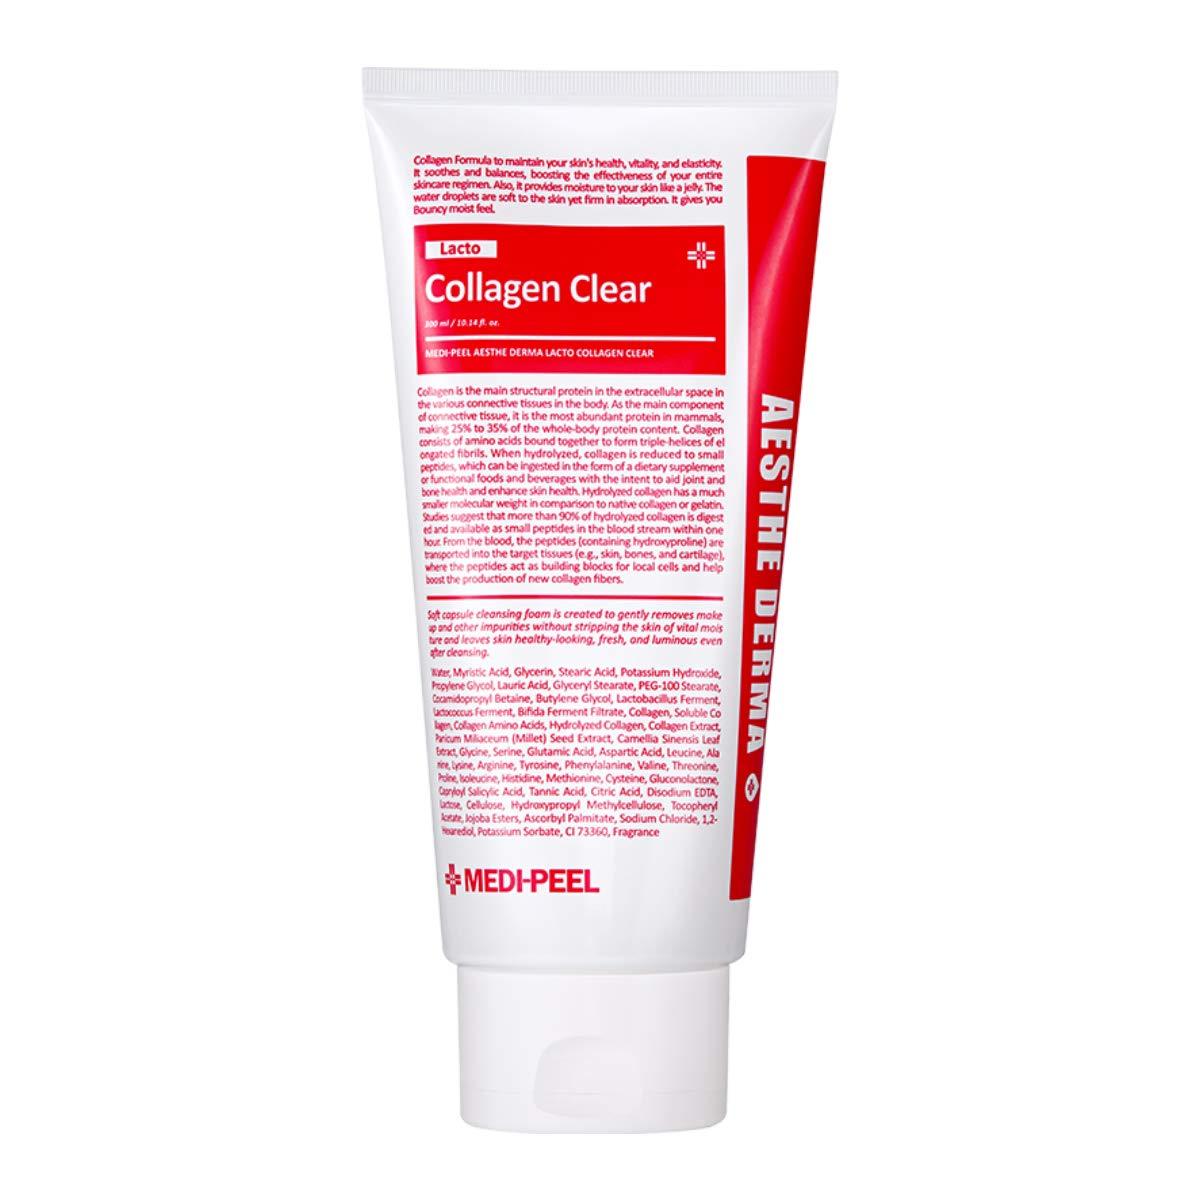 Medi-Peel Aesthe Derma Lacto Collagen Clear 300ml | Korean Facial Cleansing Foam | K-Beauty Skincare | Collagen Cleanser | Deep Cleansing | Pore Tightening | Micro Bubble | Exfoliating Cleansing Foam